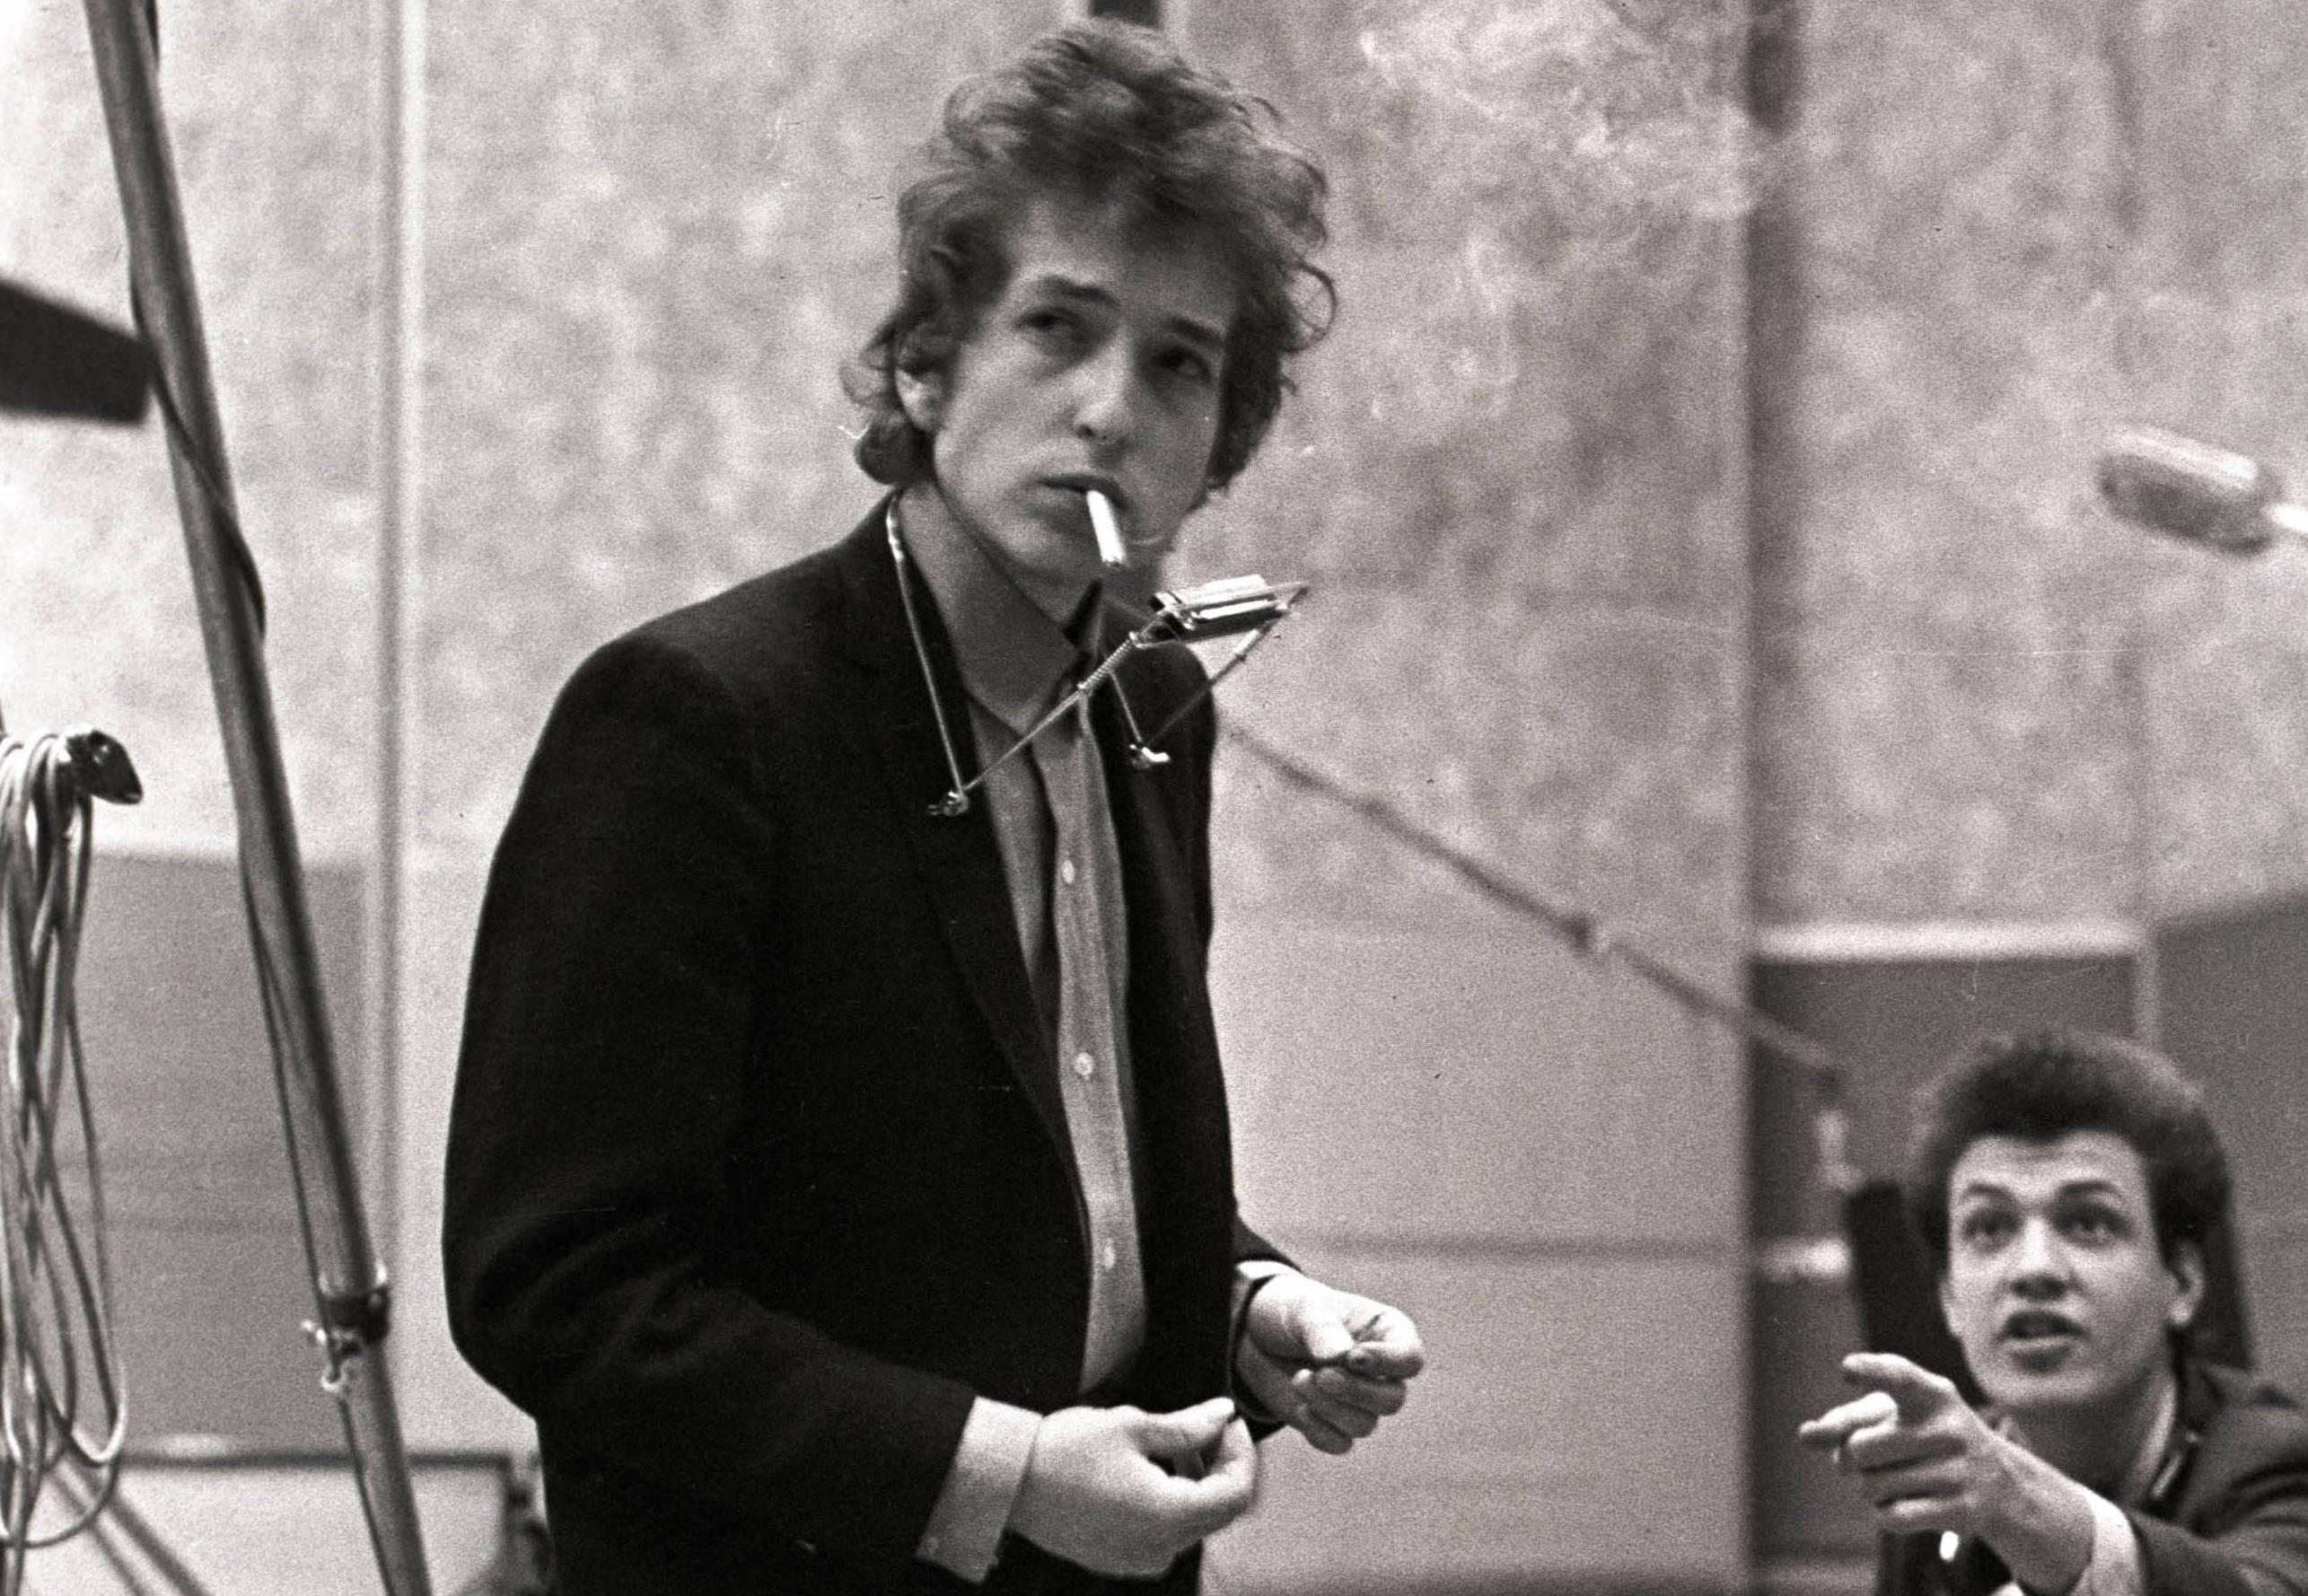 Bob Dylan's